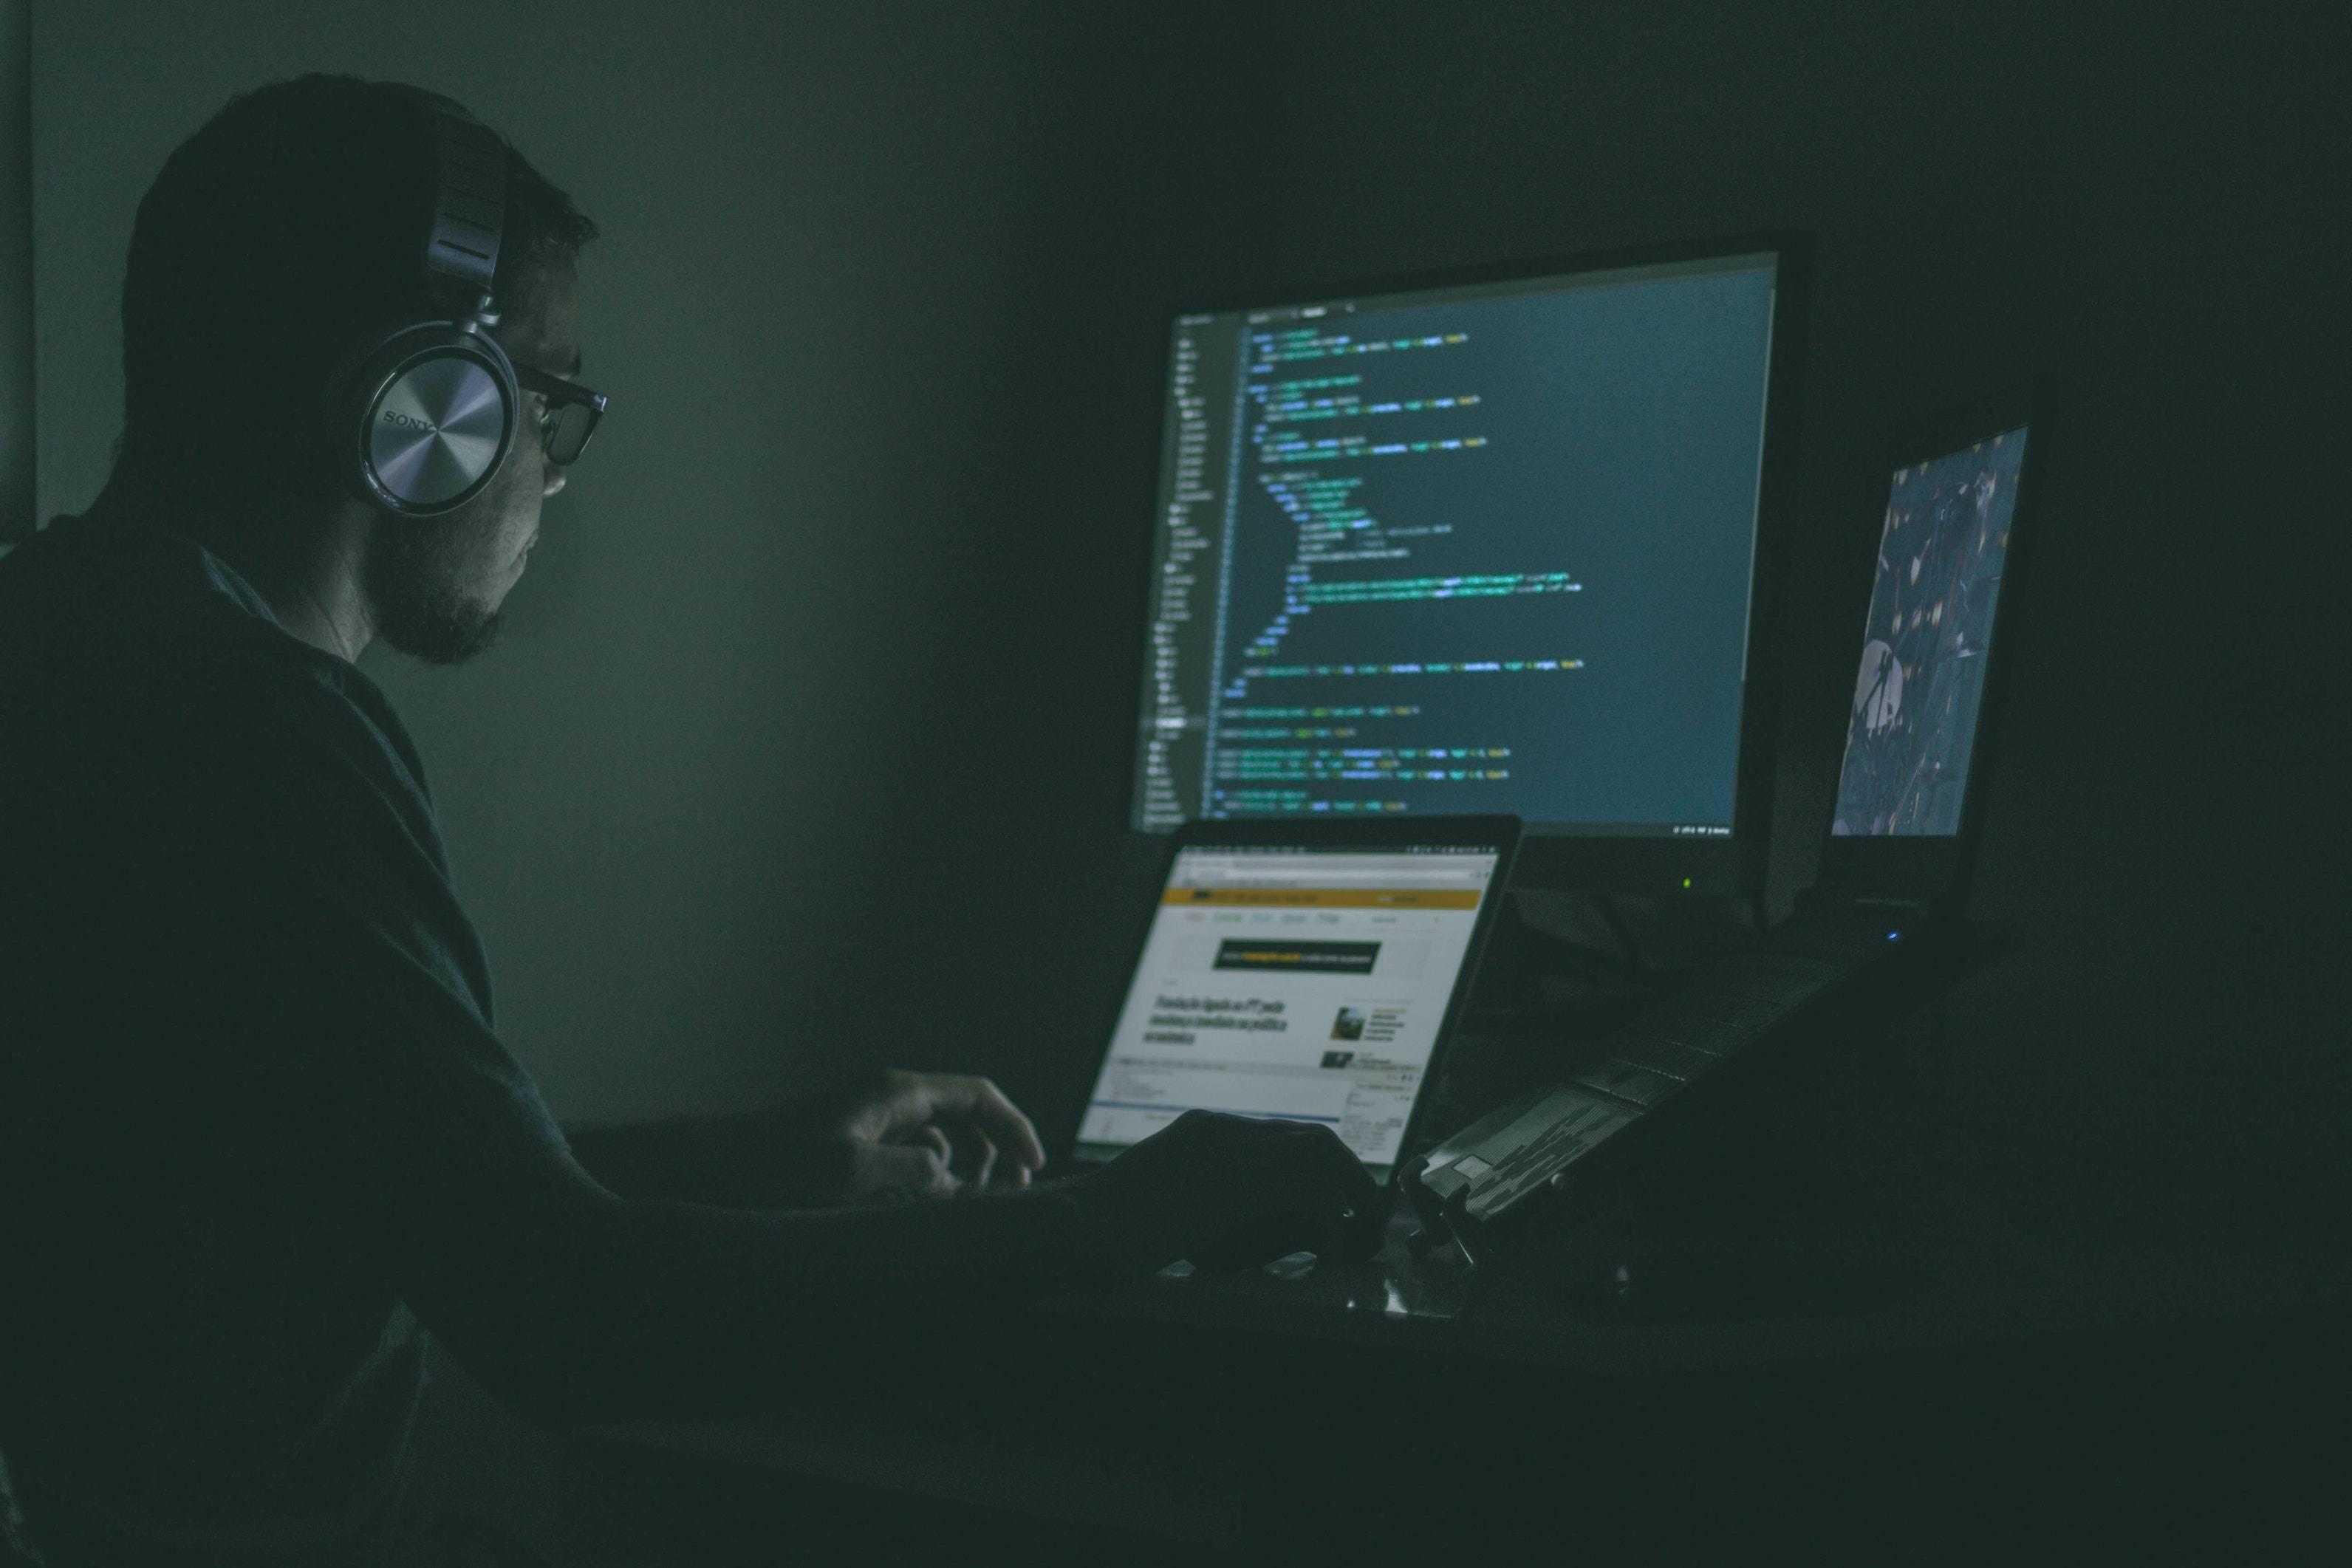 Flutter, Dart, CI/CD, Bitrise, AppCenter, Firebase, Remote Build